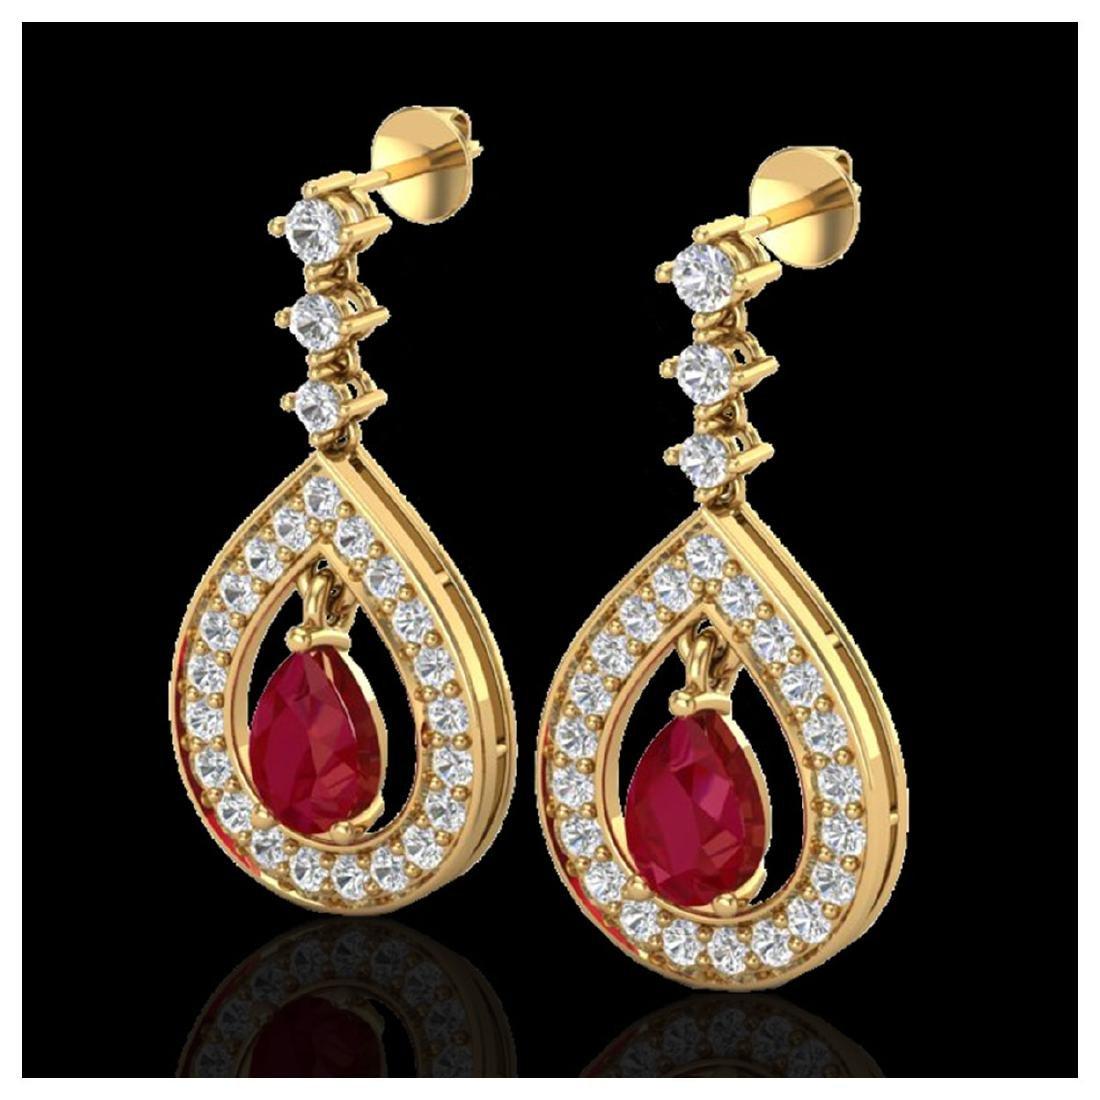 2.25 ctw Ruby & VS/SI Diamond Earrings 14K Yellow Gold